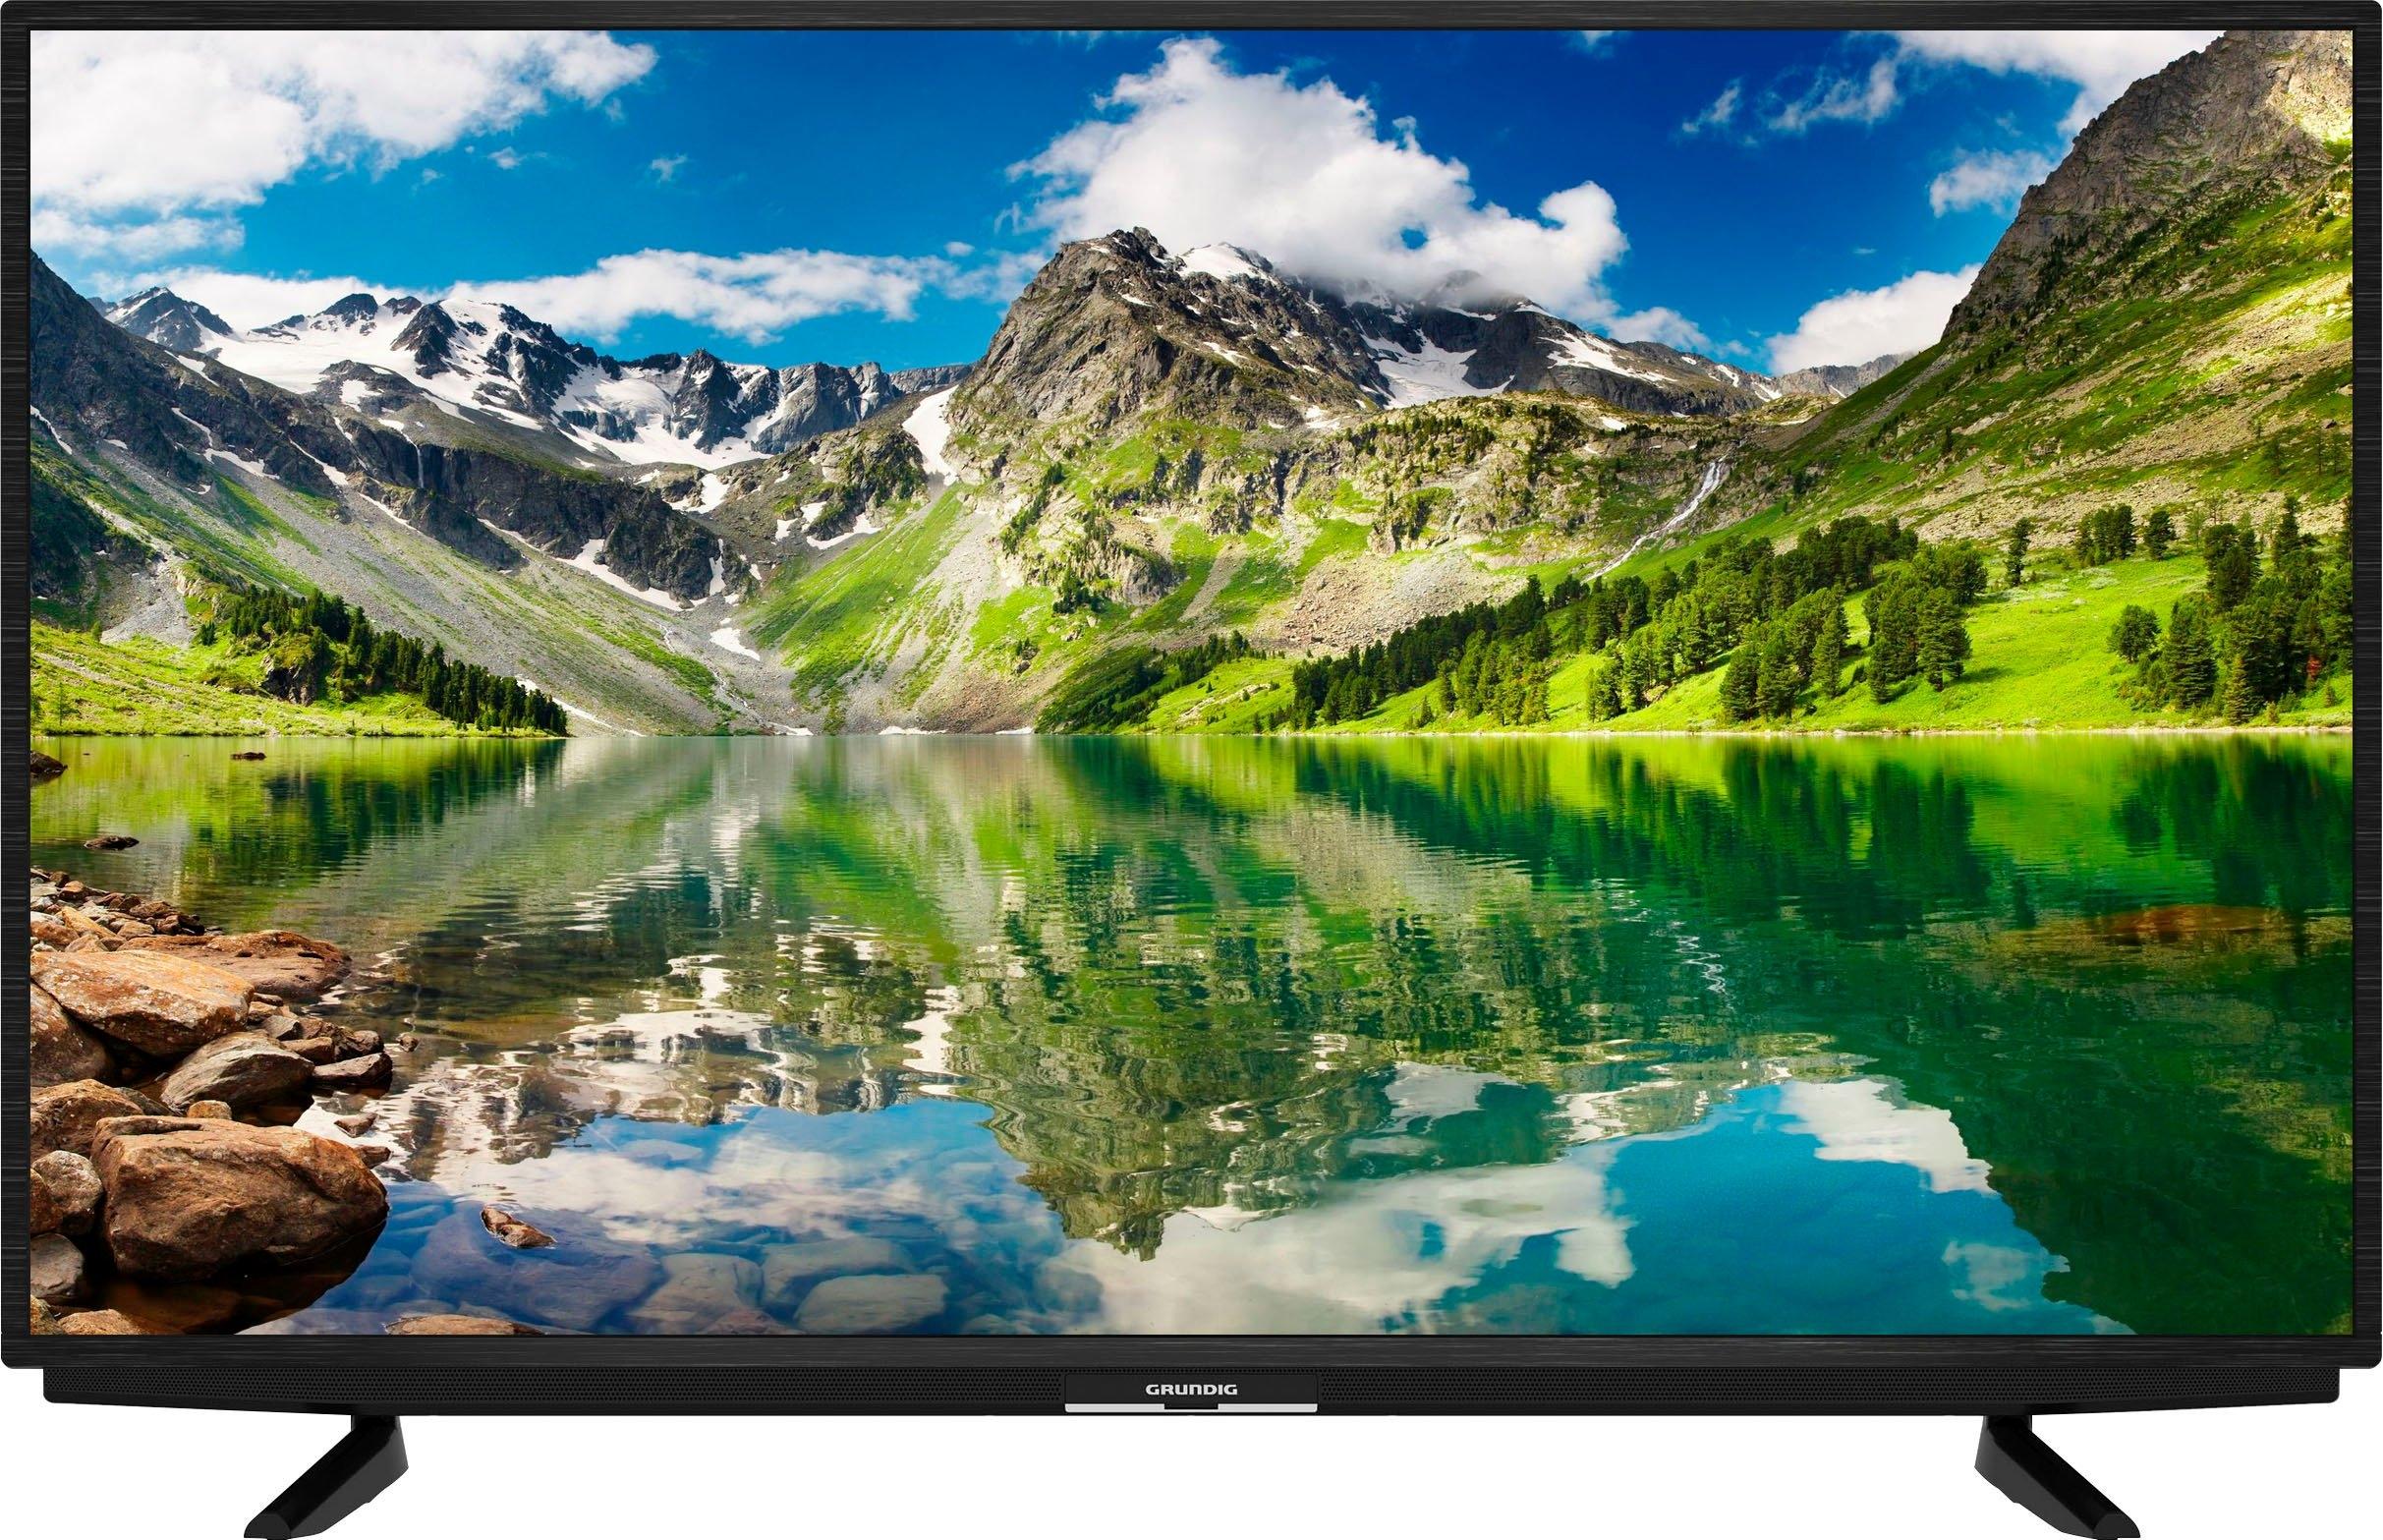 Grundig LED-TV 55 VOE 71 - Fire TV Edition TRH000, 139 cm / 55